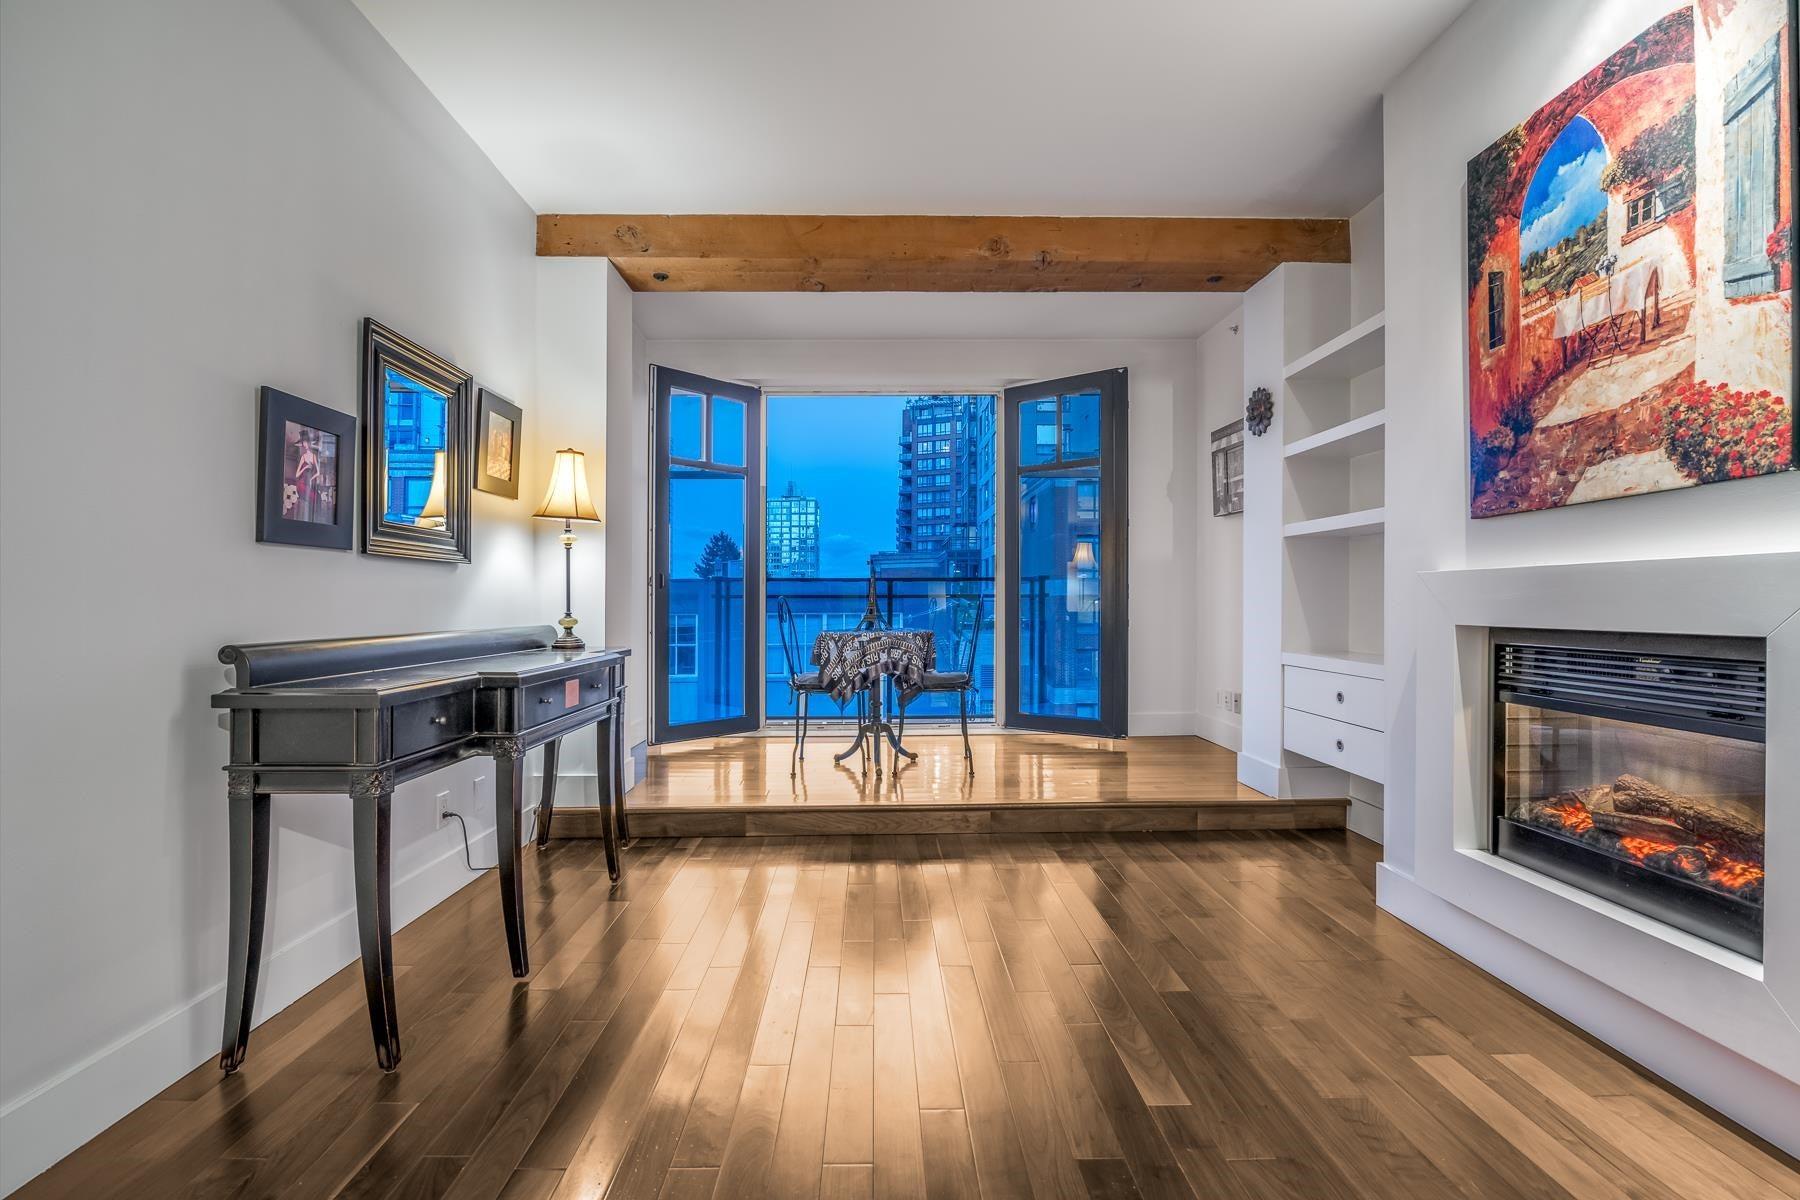 303 1275 HAMILTON STREET - Yaletown Apartment/Condo for sale, 1 Bedroom (R2606541) - #1